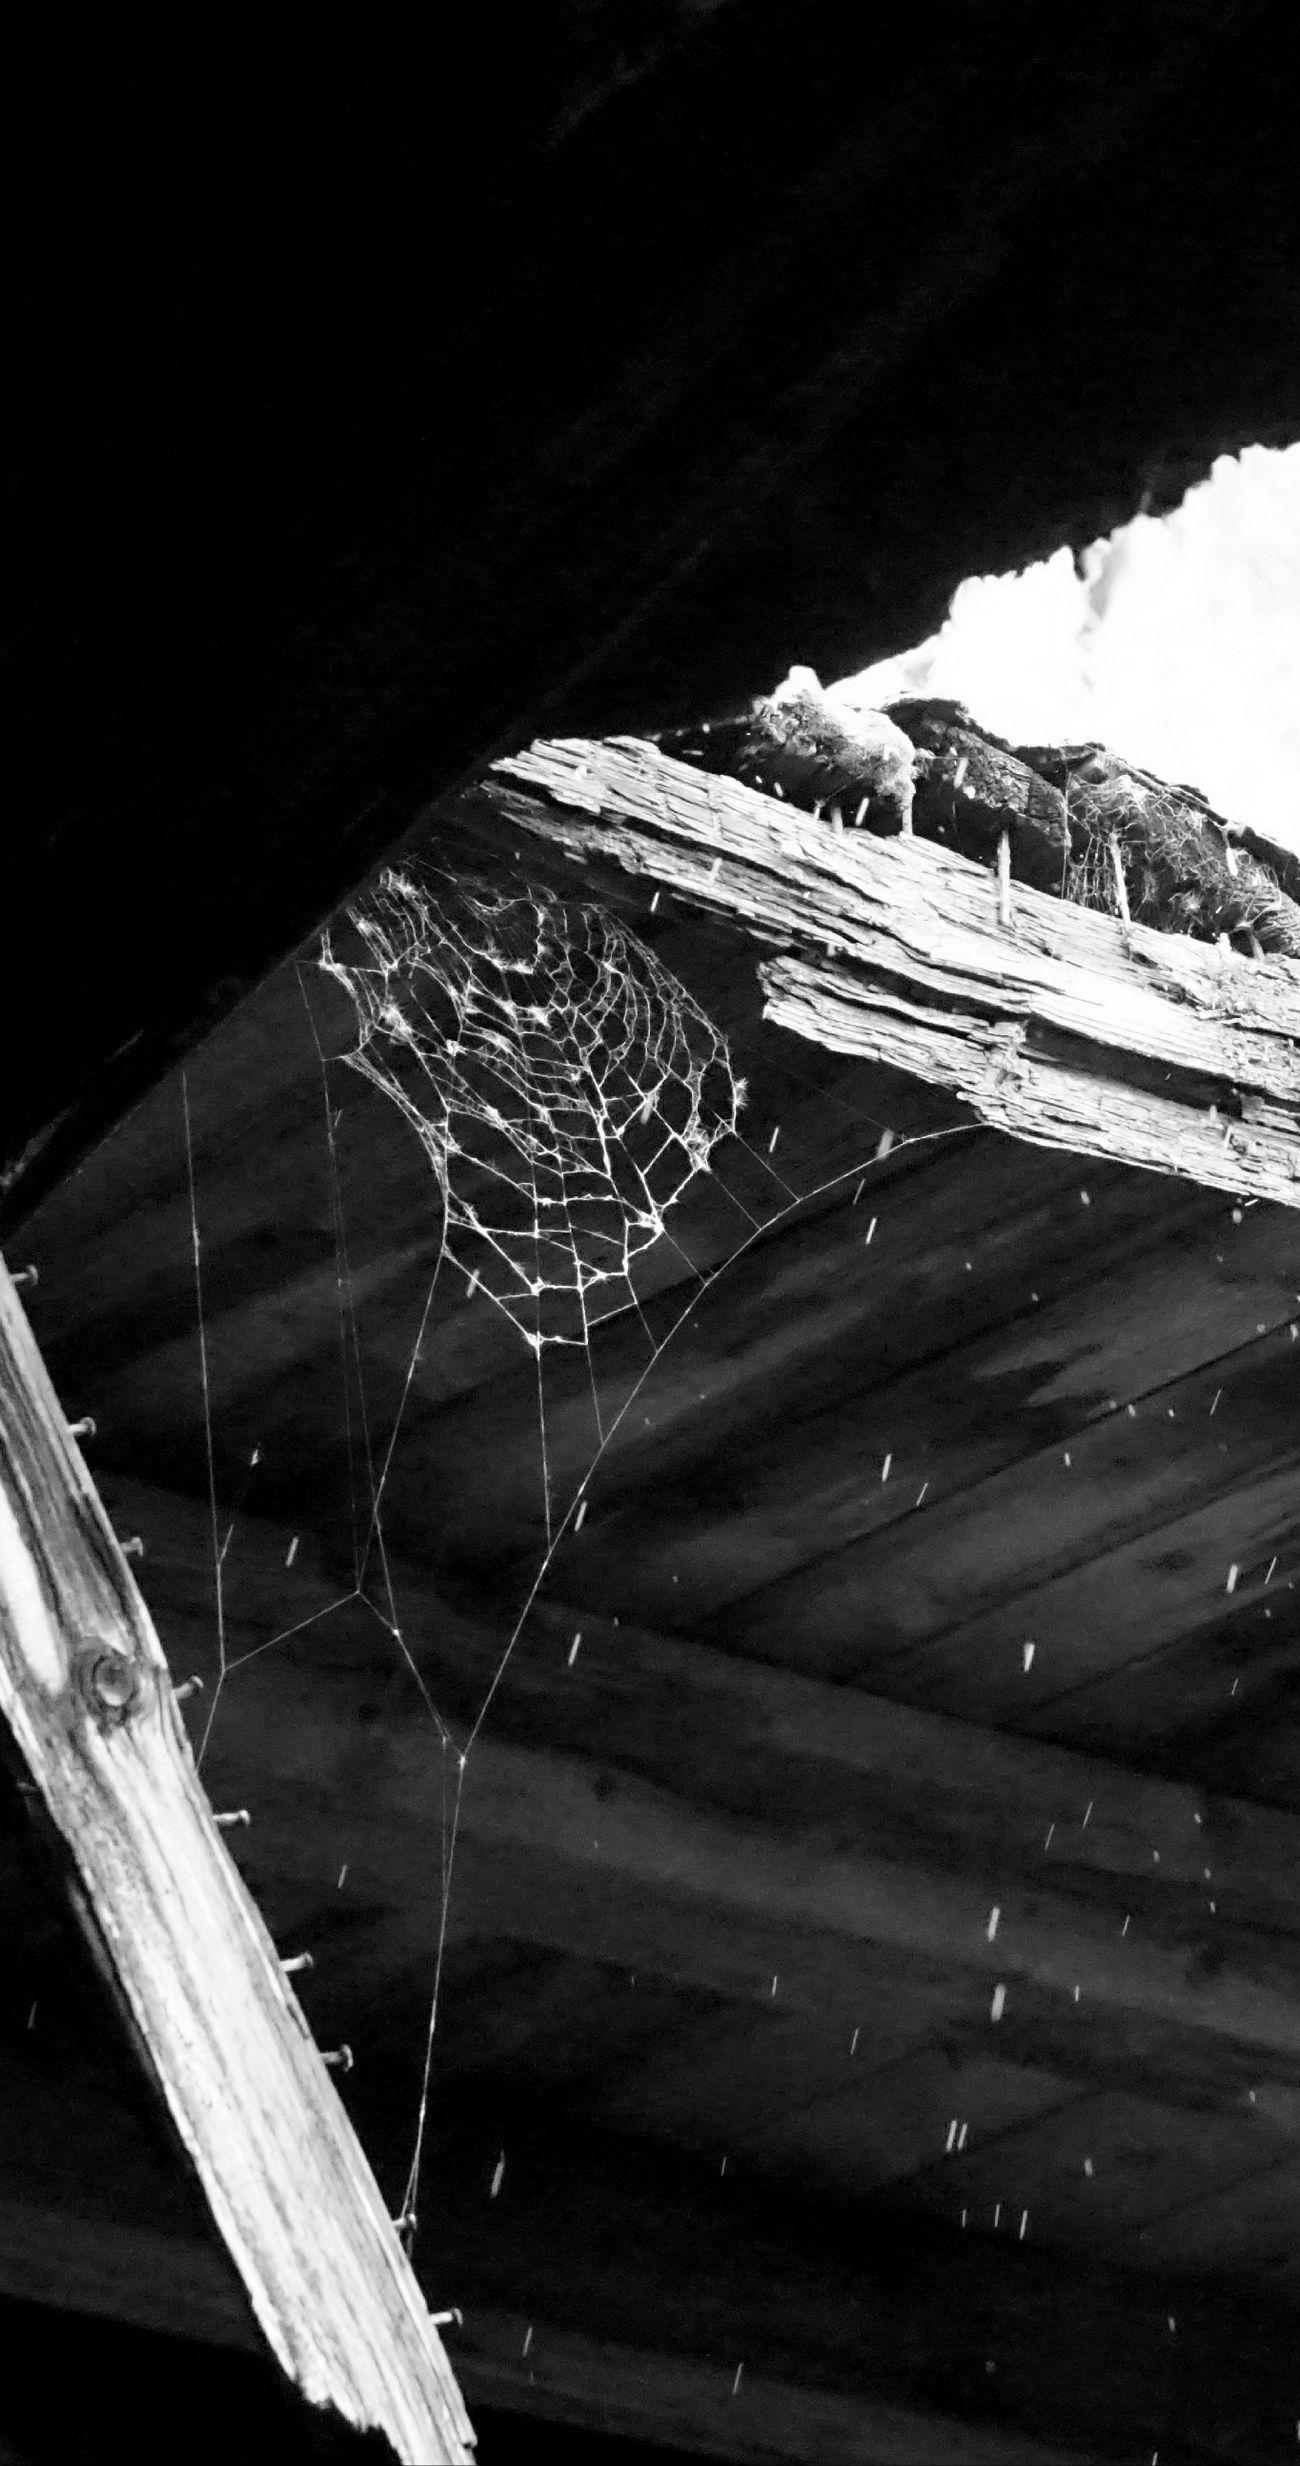 Water EyeEm Gallery EyeEm Best Shots EyeEm EyeEmNewHere Spidersweb Spider Every Picture Tells A Story Eyeemphoto Beauty In Nature Rainy Days☔ Raining Outside EyeEm Best Shots - Black + White